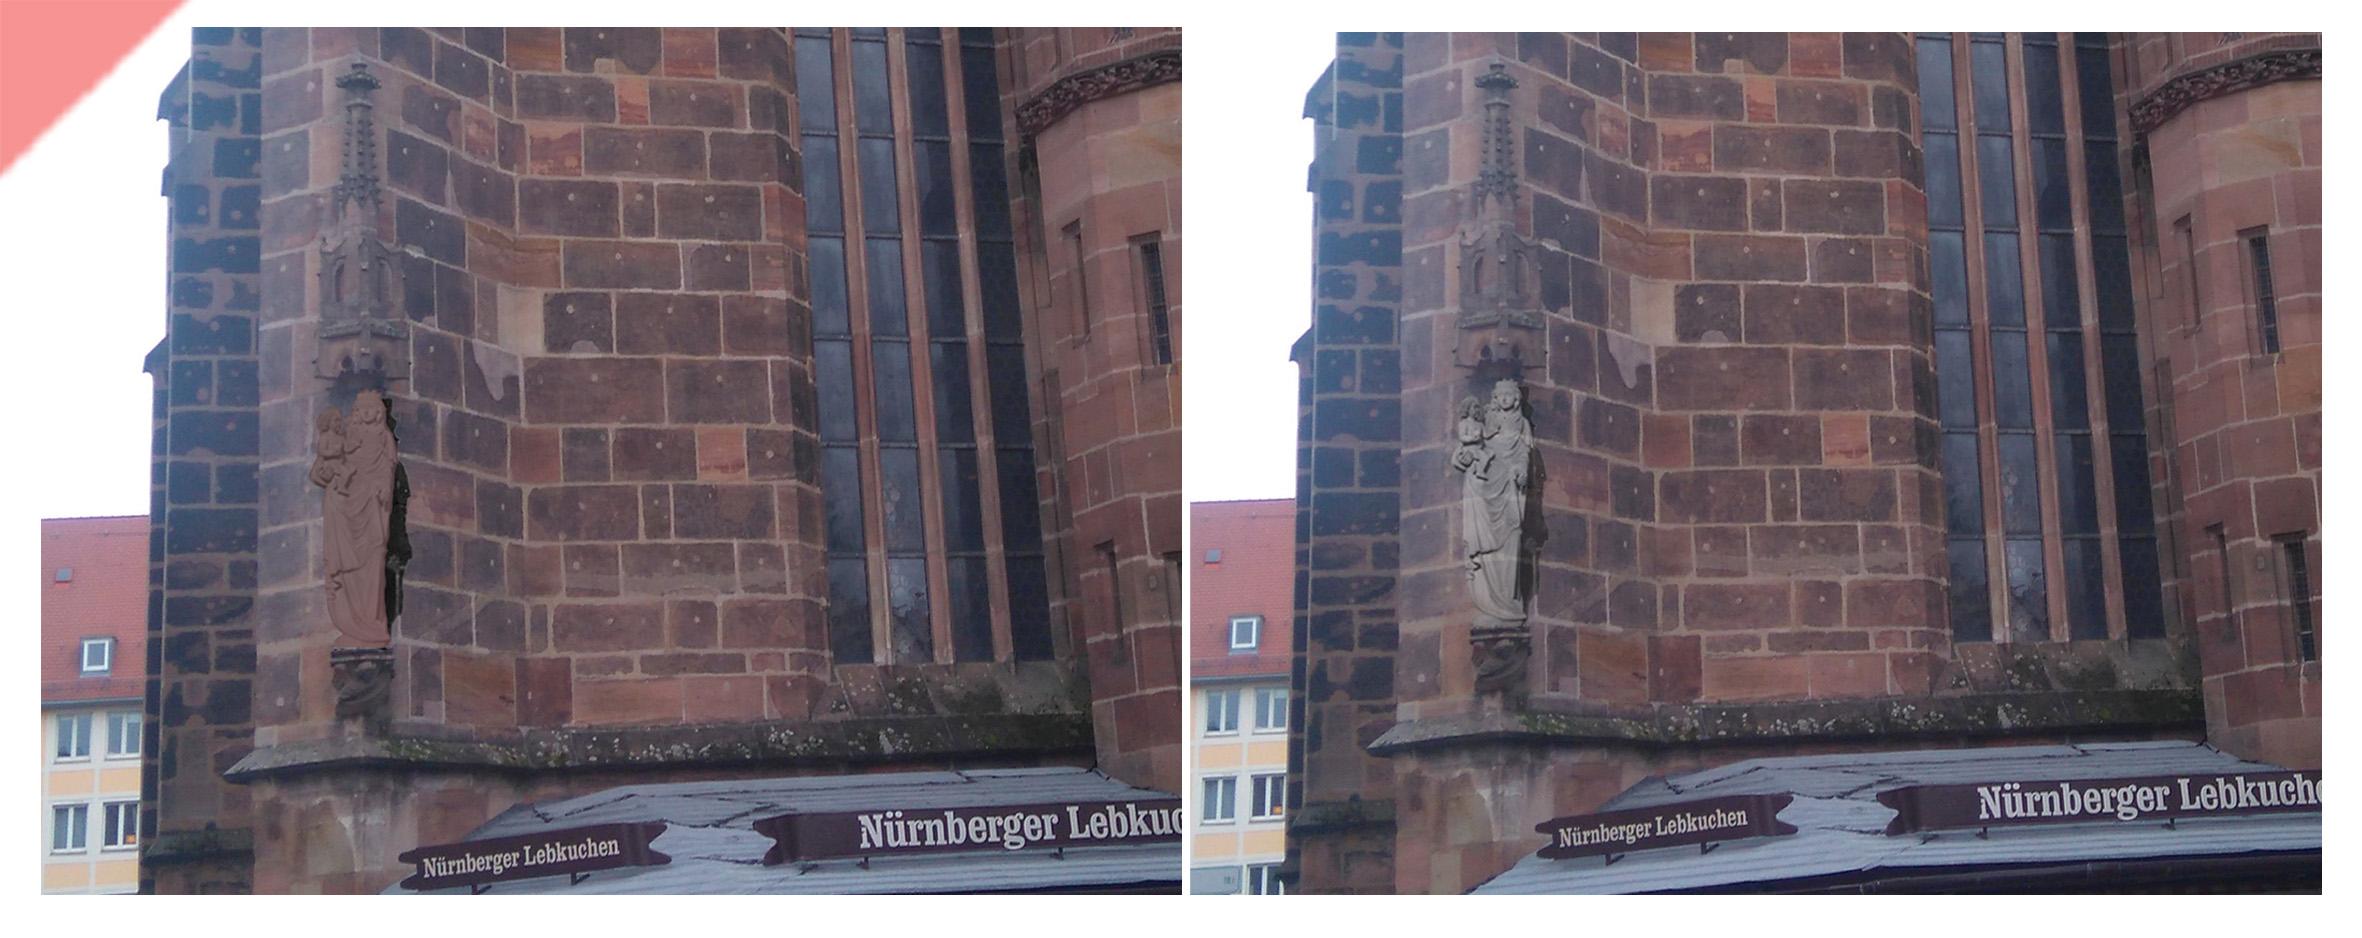 Frauenkirche-Liebfrauenkirche-Nürnberg-Maria-Jesuskind-Nordwest-Ecke